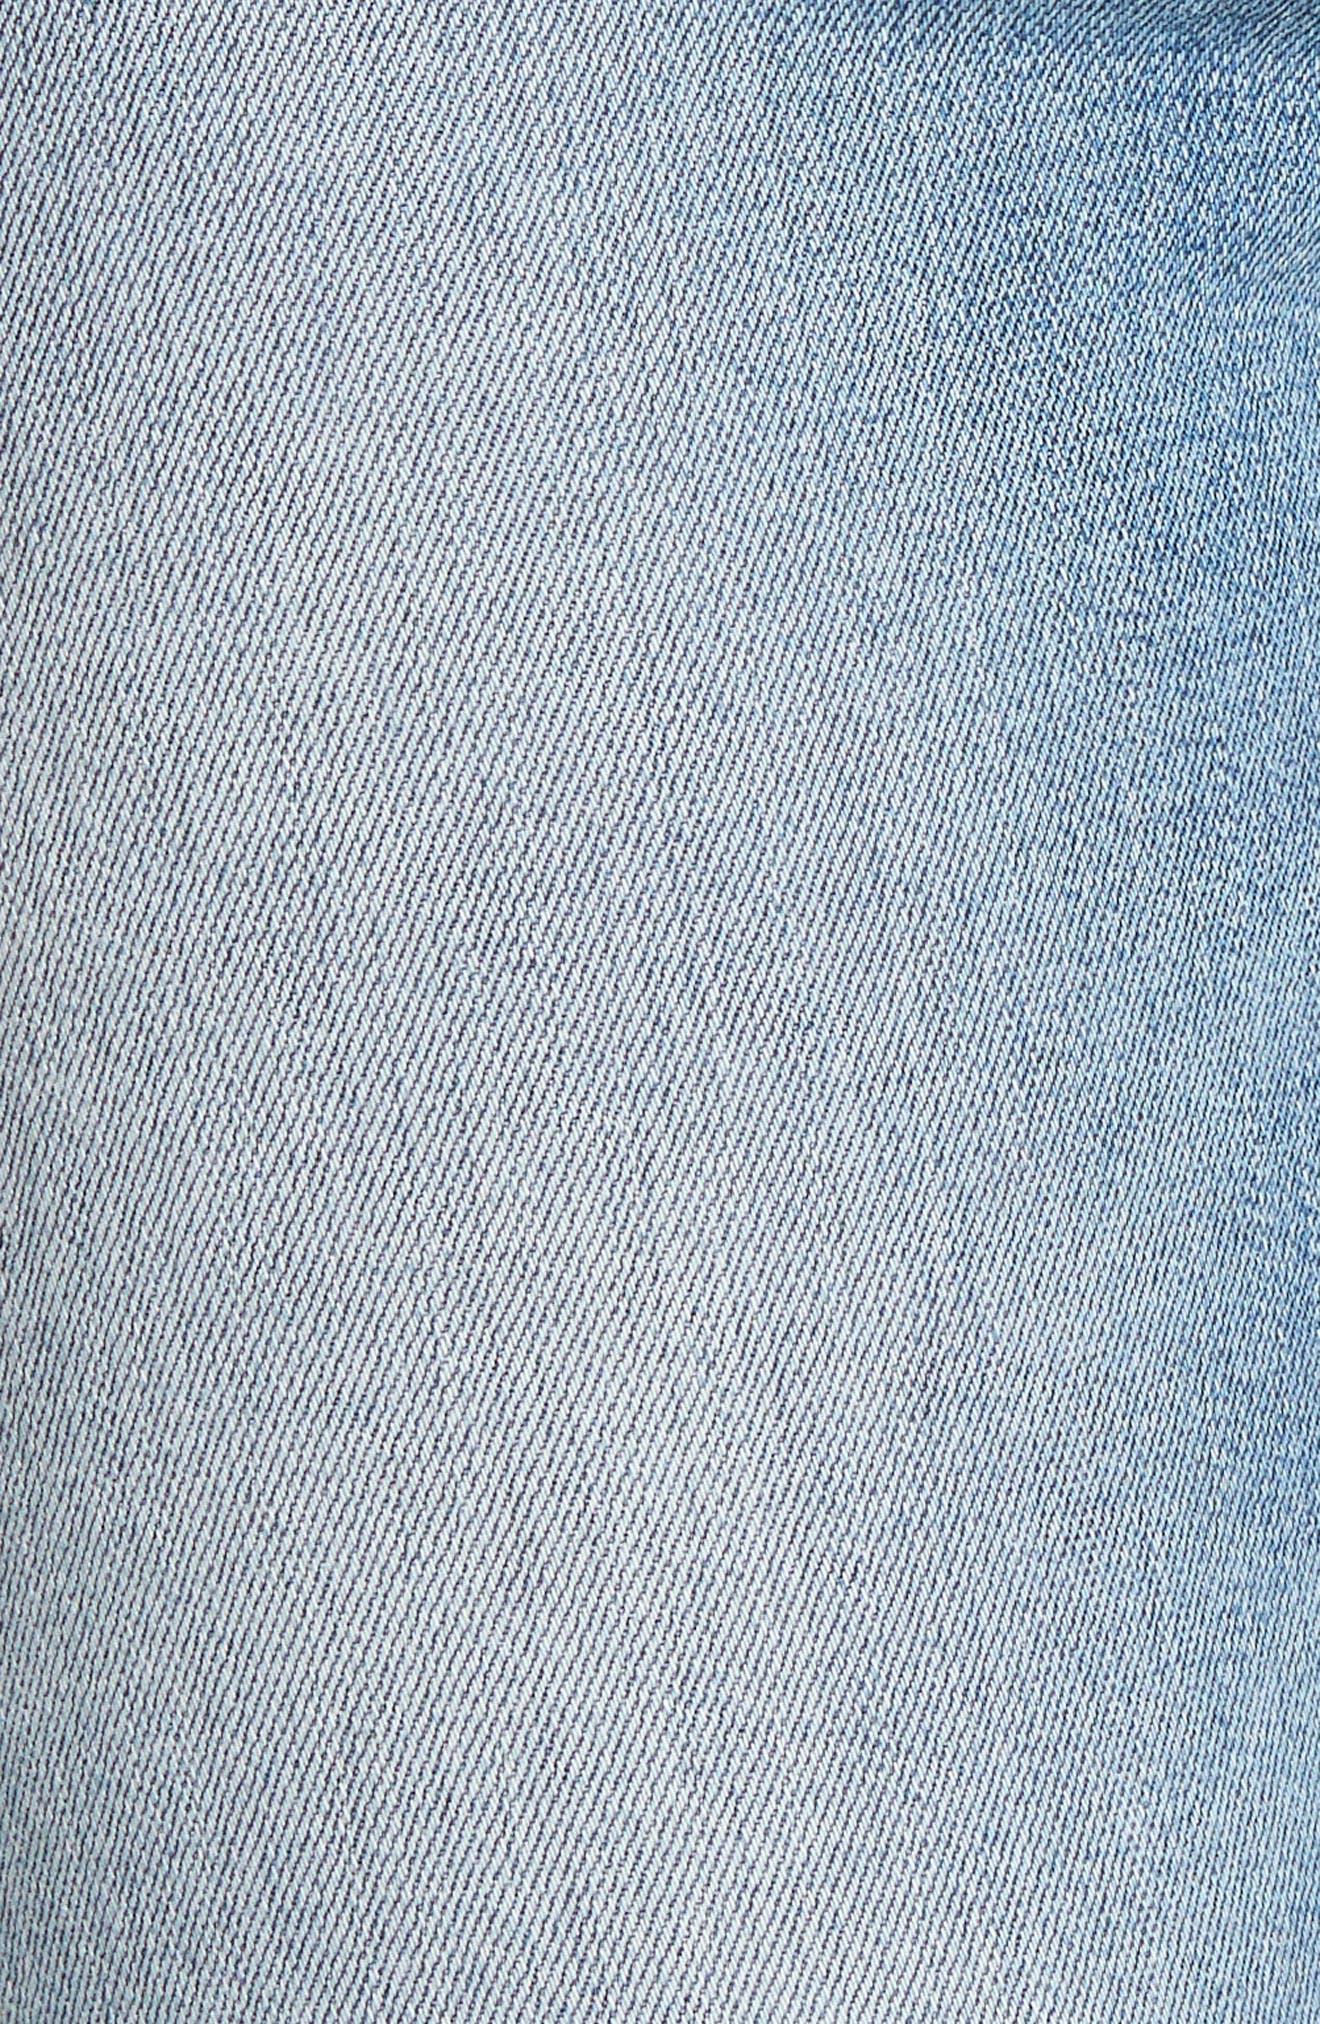 Bullocks Lace-Up High Waist Super Skinny Jeans,                             Alternate thumbnail 11, color,